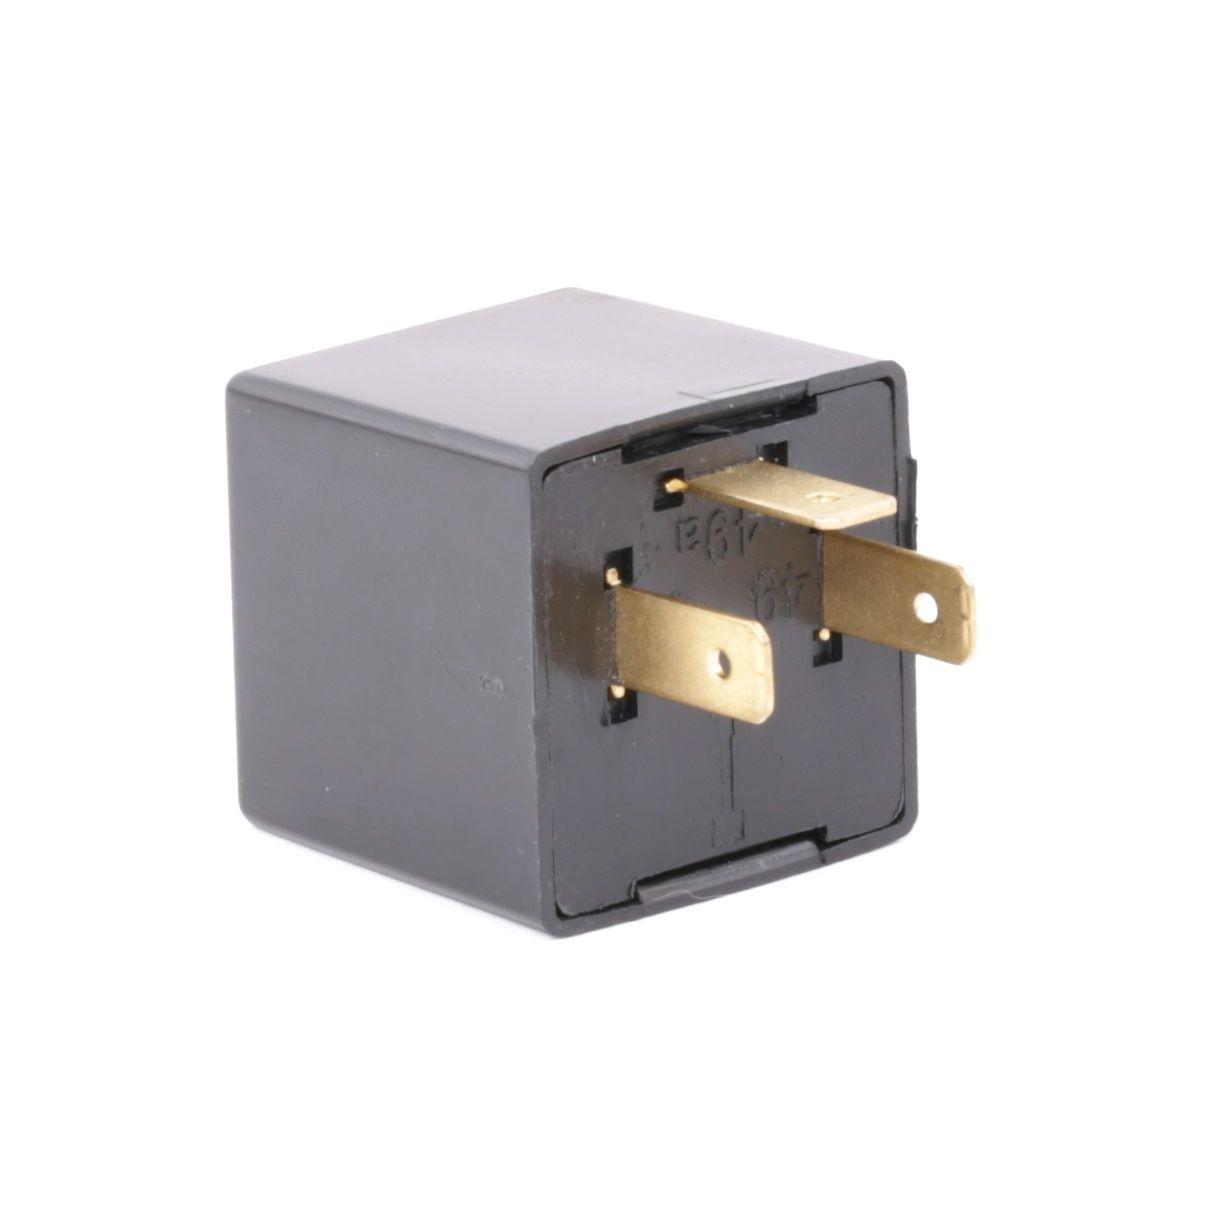 Flasher Unit 11574 Febi Indicator Relay 191953227 191953227A 176953227 Quality